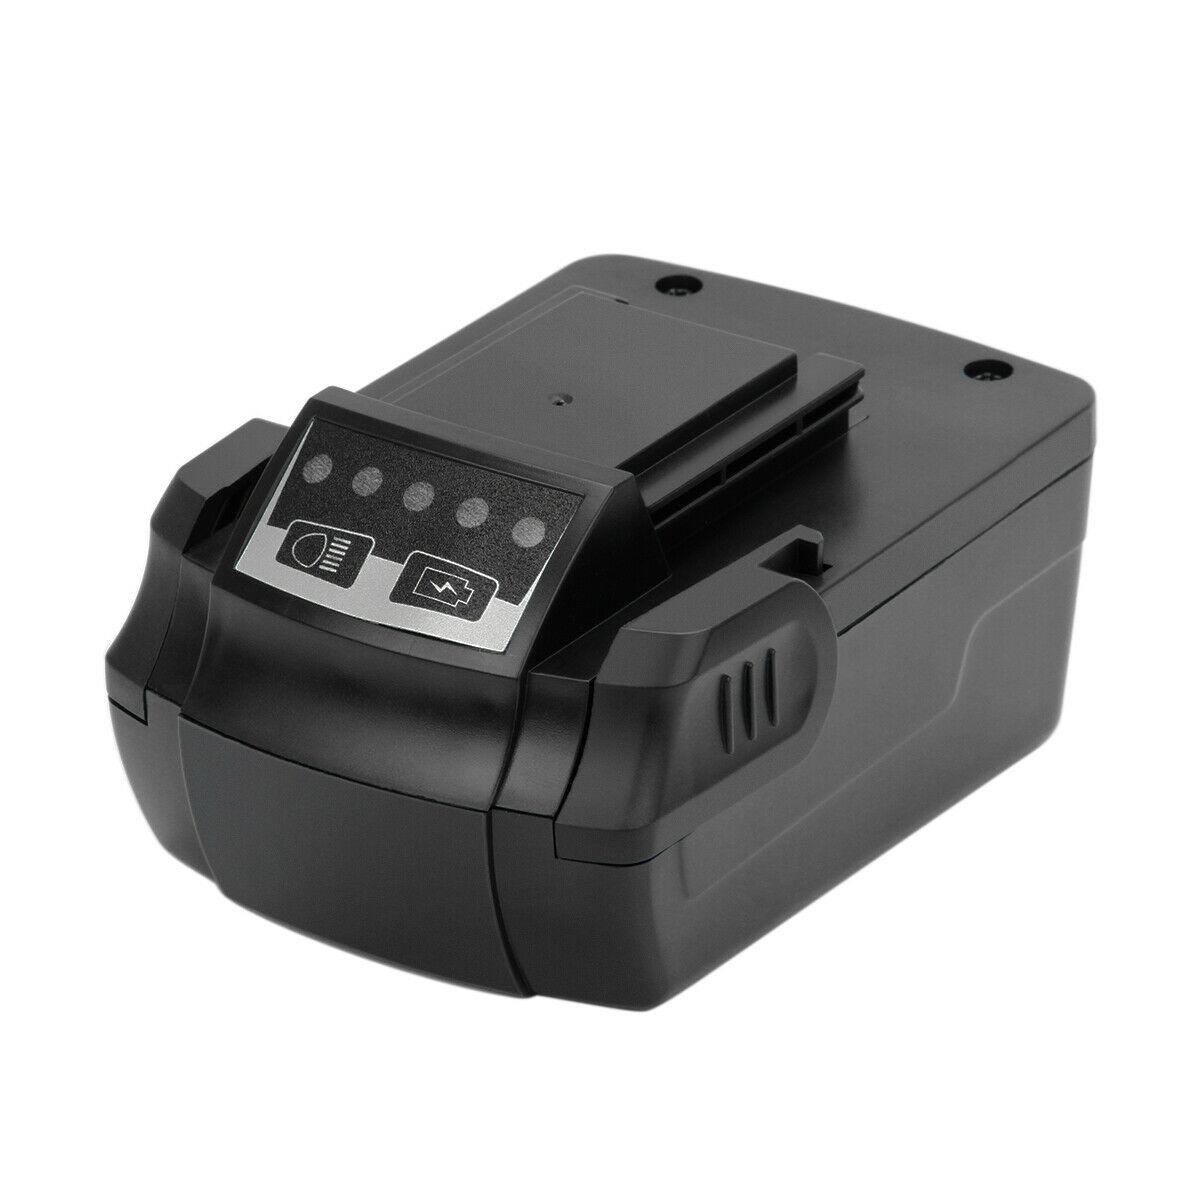 14.4V 4000mAH lithium ion APF 144 / 4.2 98044605 98044606 12310127 (kompatibelt batteri)